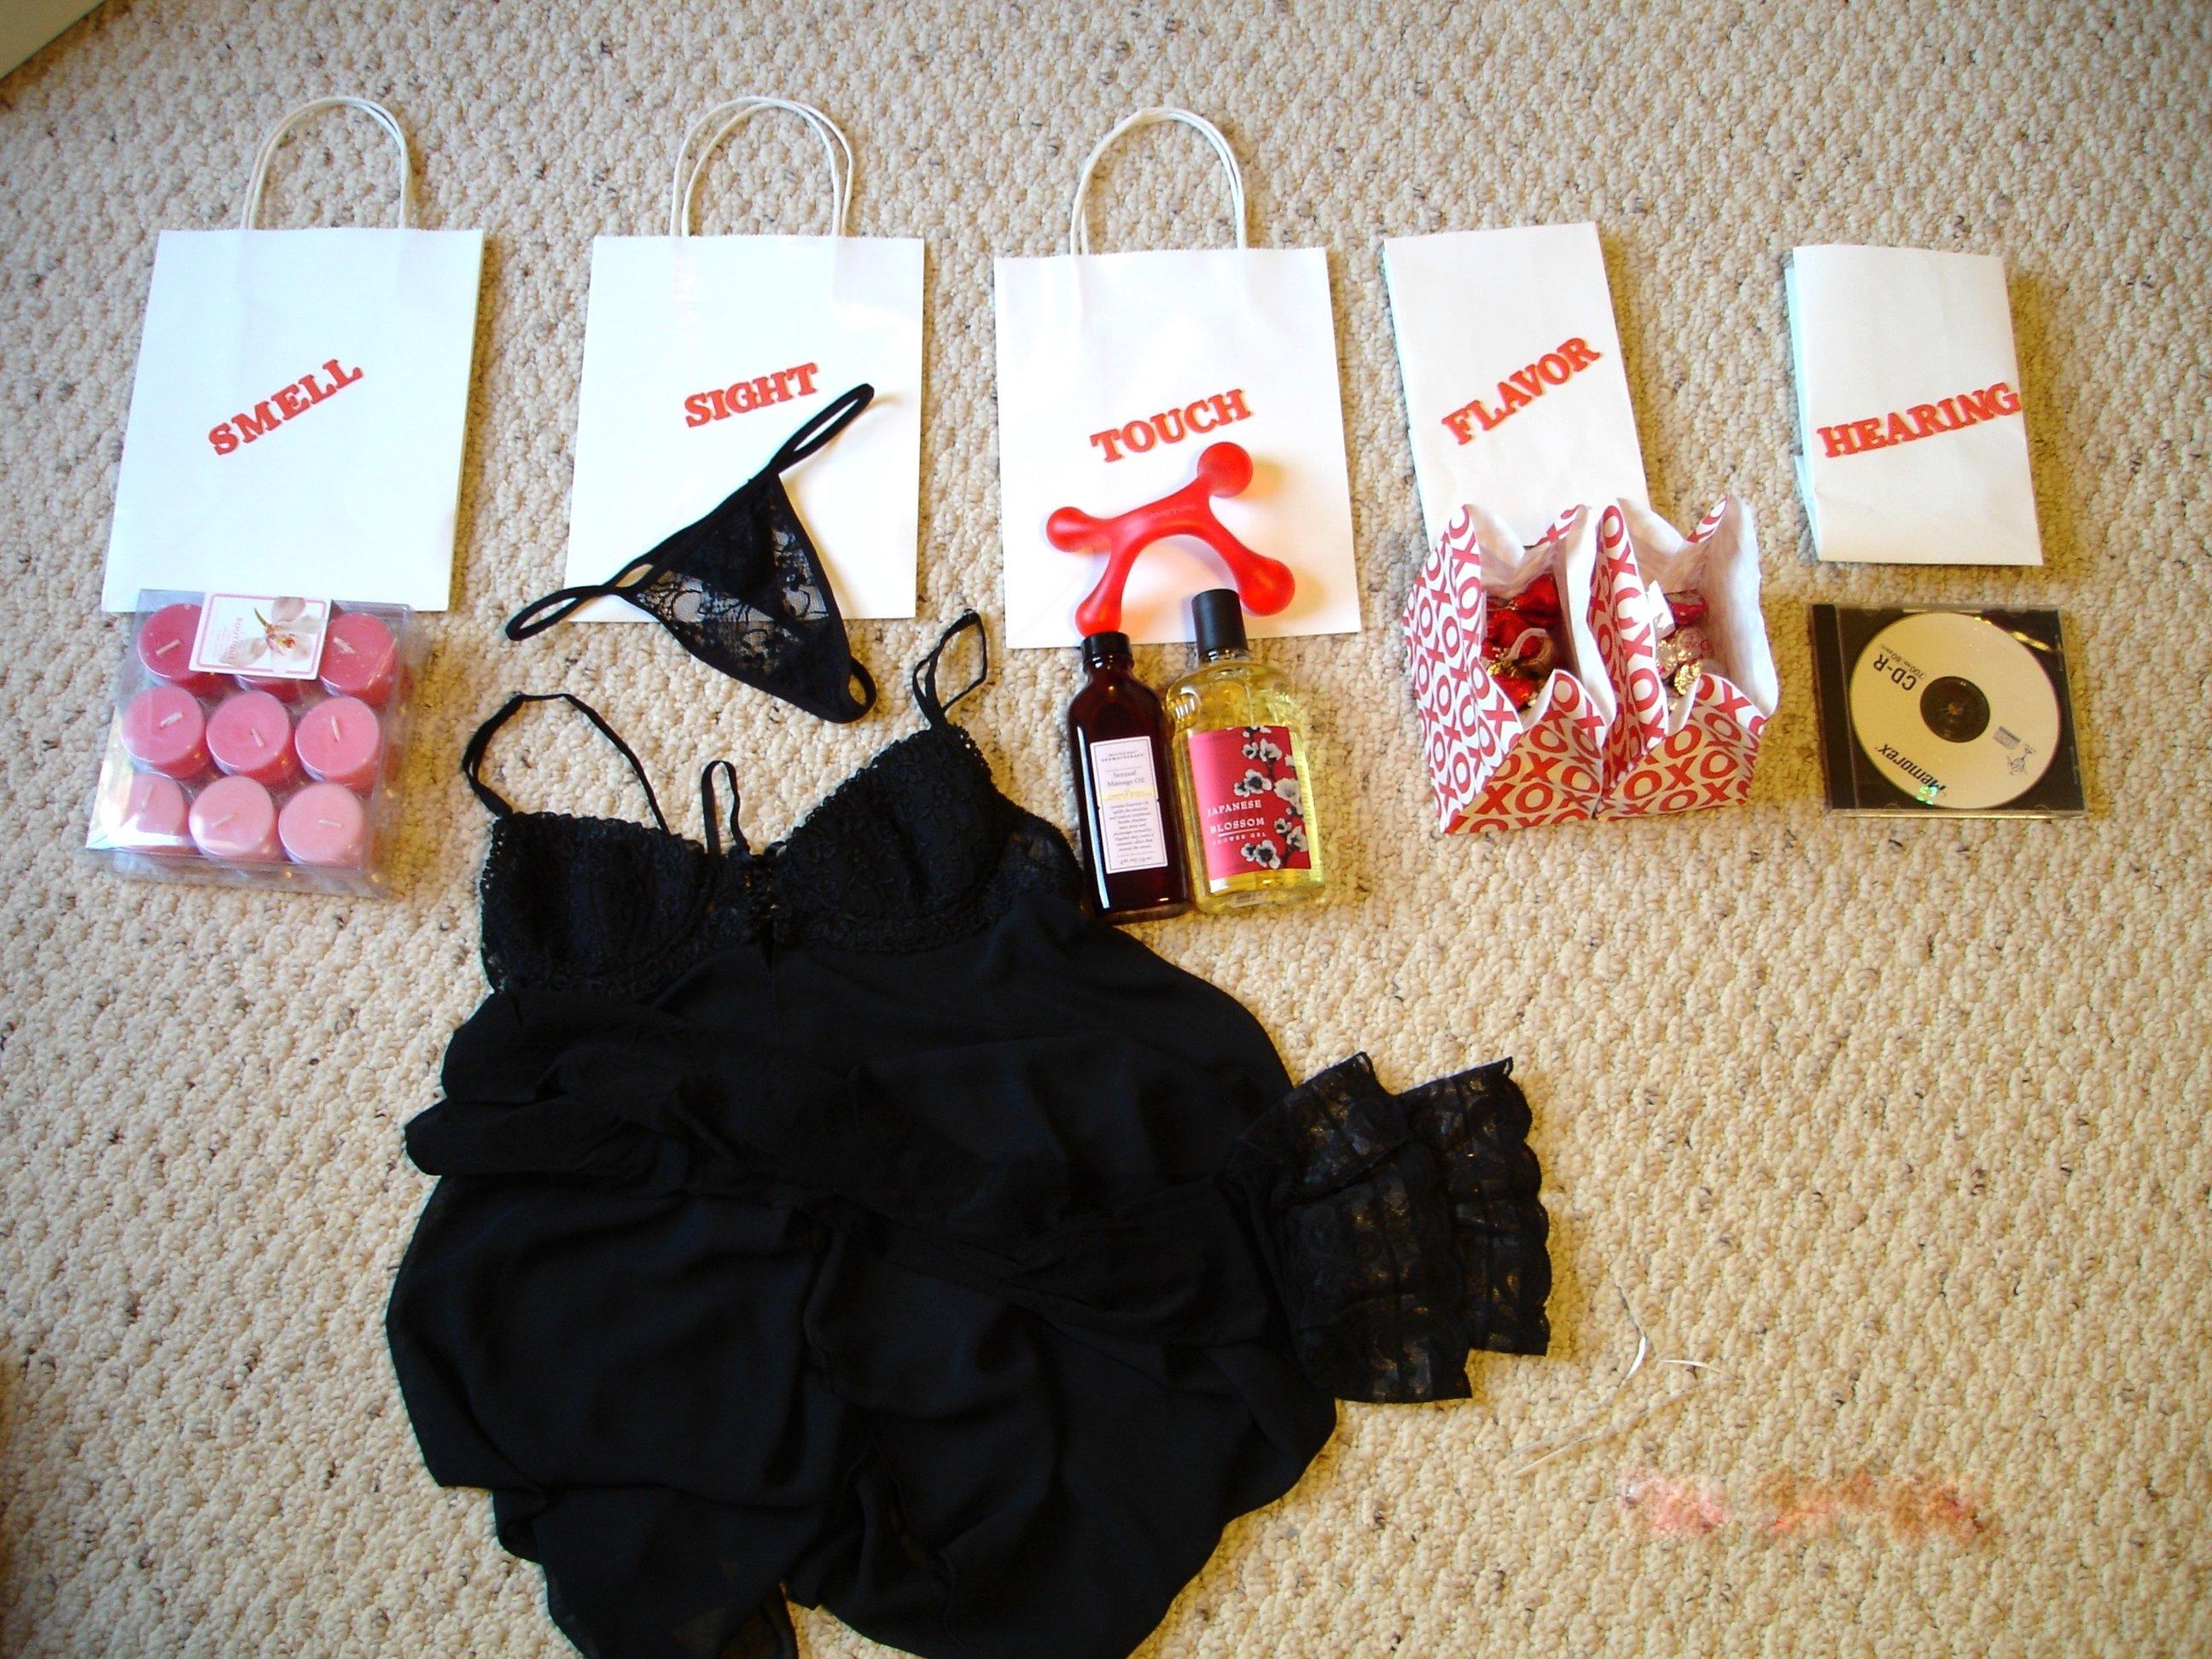 10 Elegant Christmas Present Ideas For Boyfriend gift ideas for boyfriend christmas gift ideas for deployed boyfriend